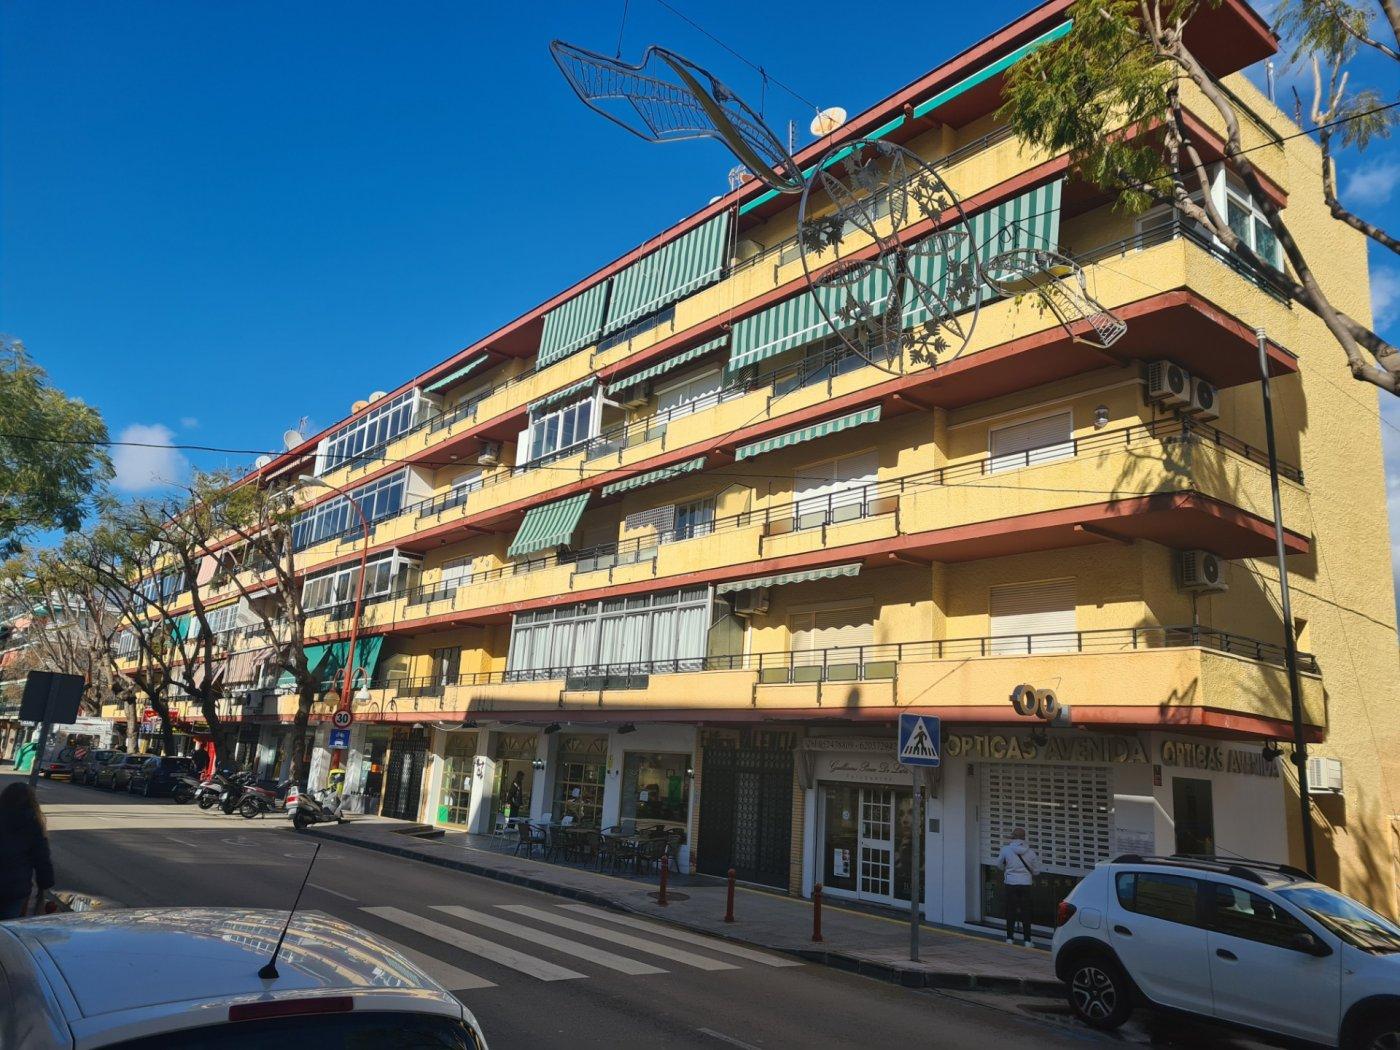 Piso en alquiler en Centro - avenida de mijas, Fuengirola